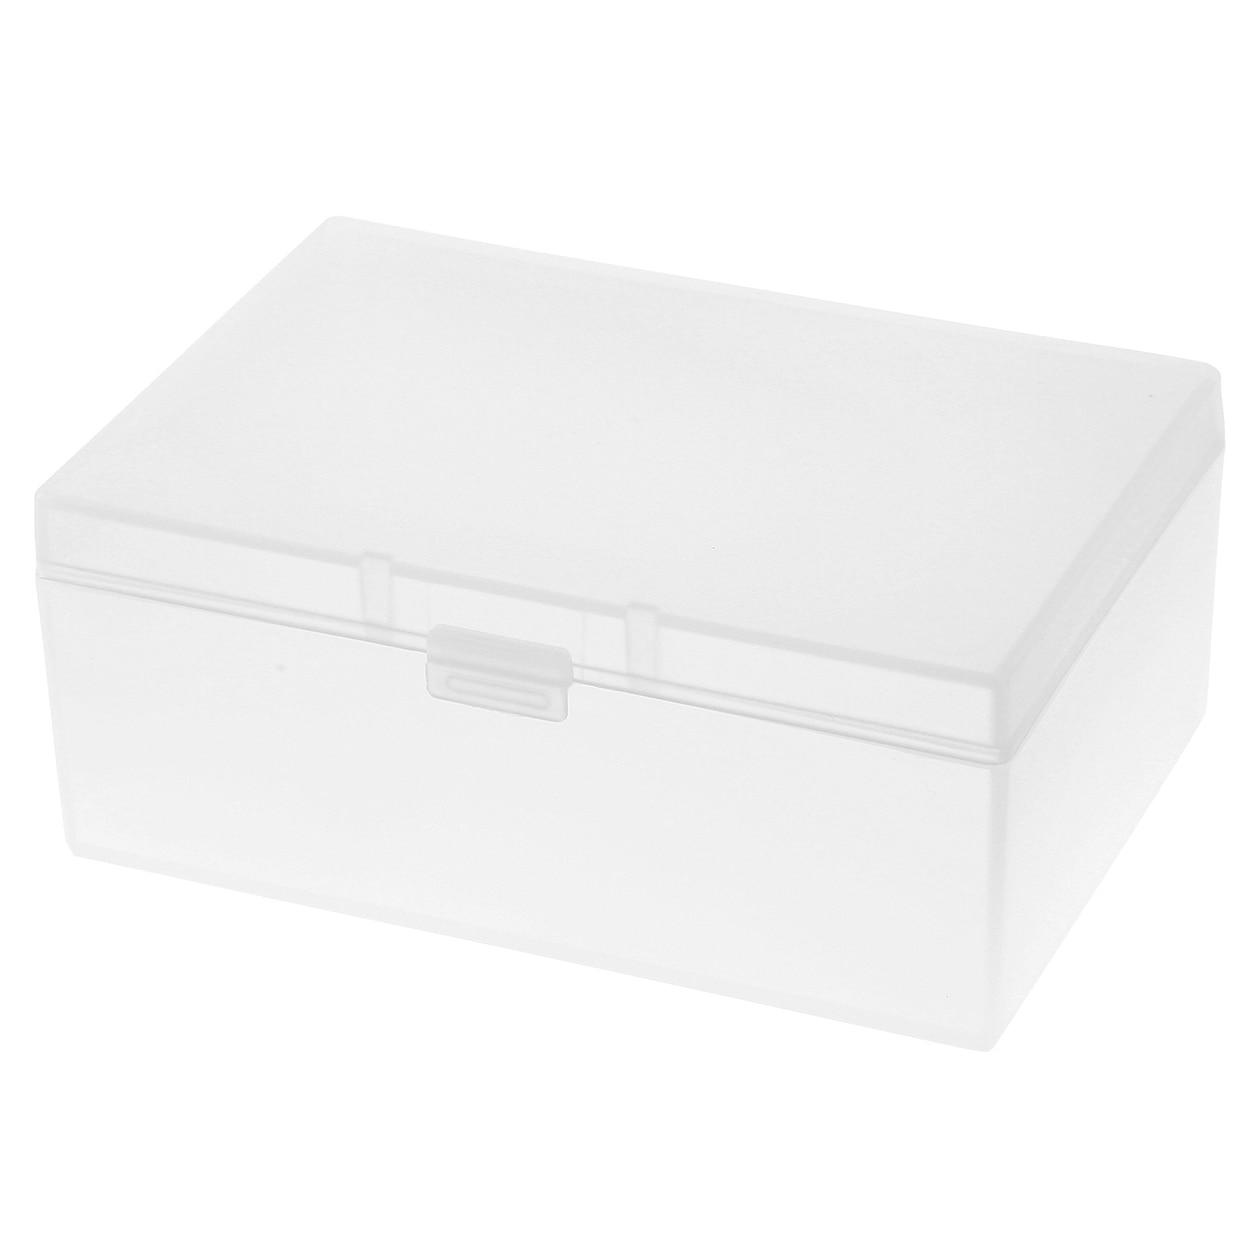 RoomClip商品情報 - ポリプロピレン救急用品ケース